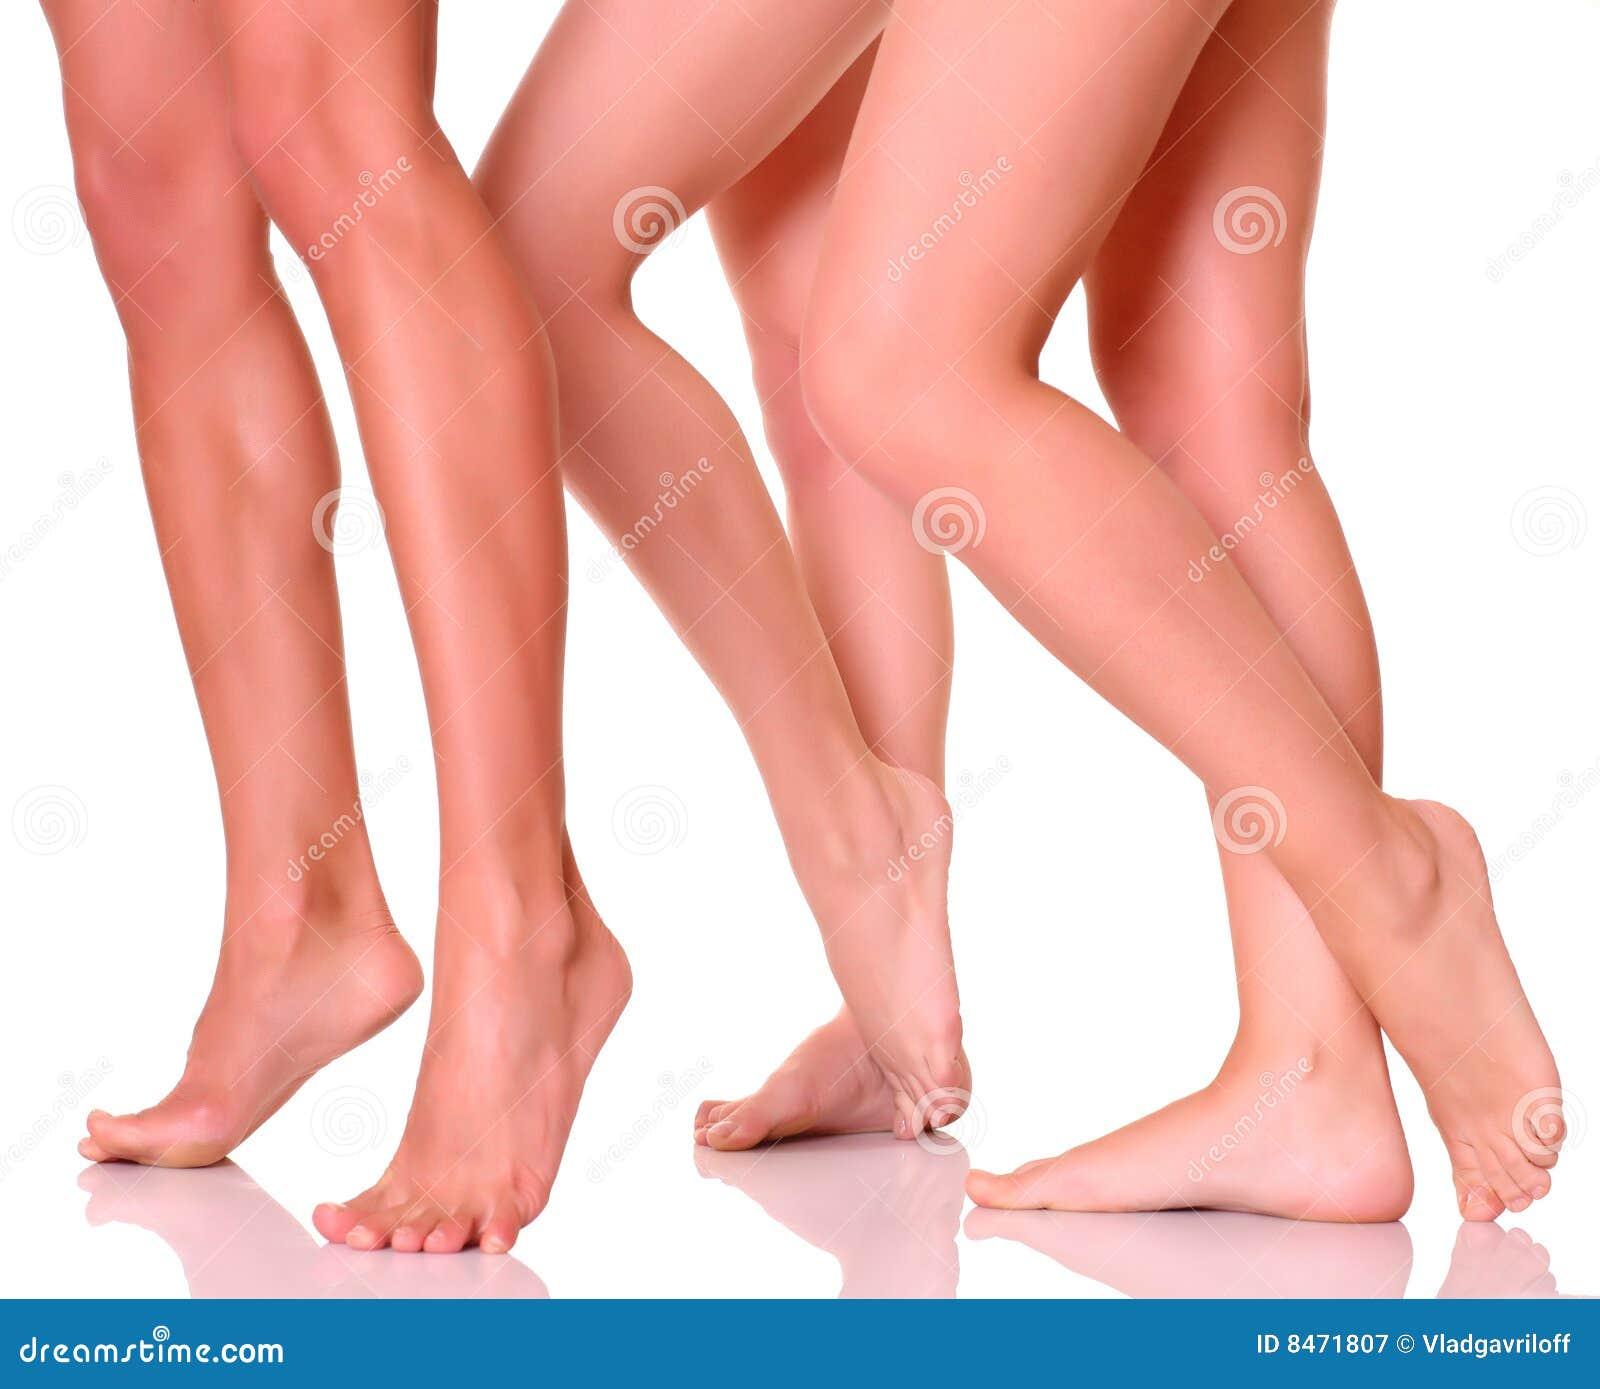 Feet Stock Image  Image Of Female  Shoe  Thigh  Charming